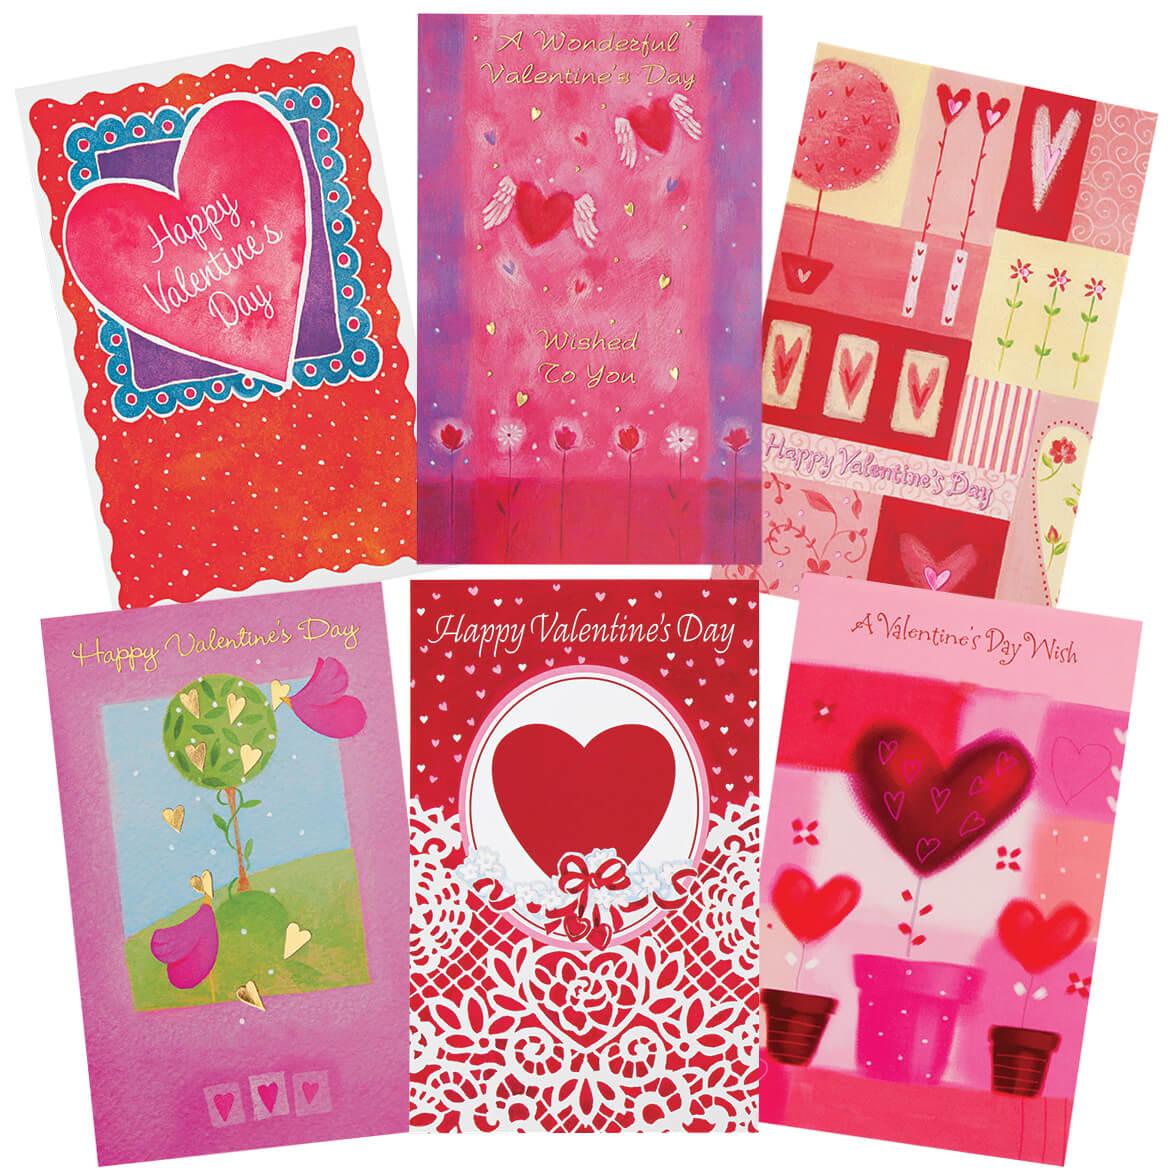 Valentine's Day Card Assortment Set of 20-350352